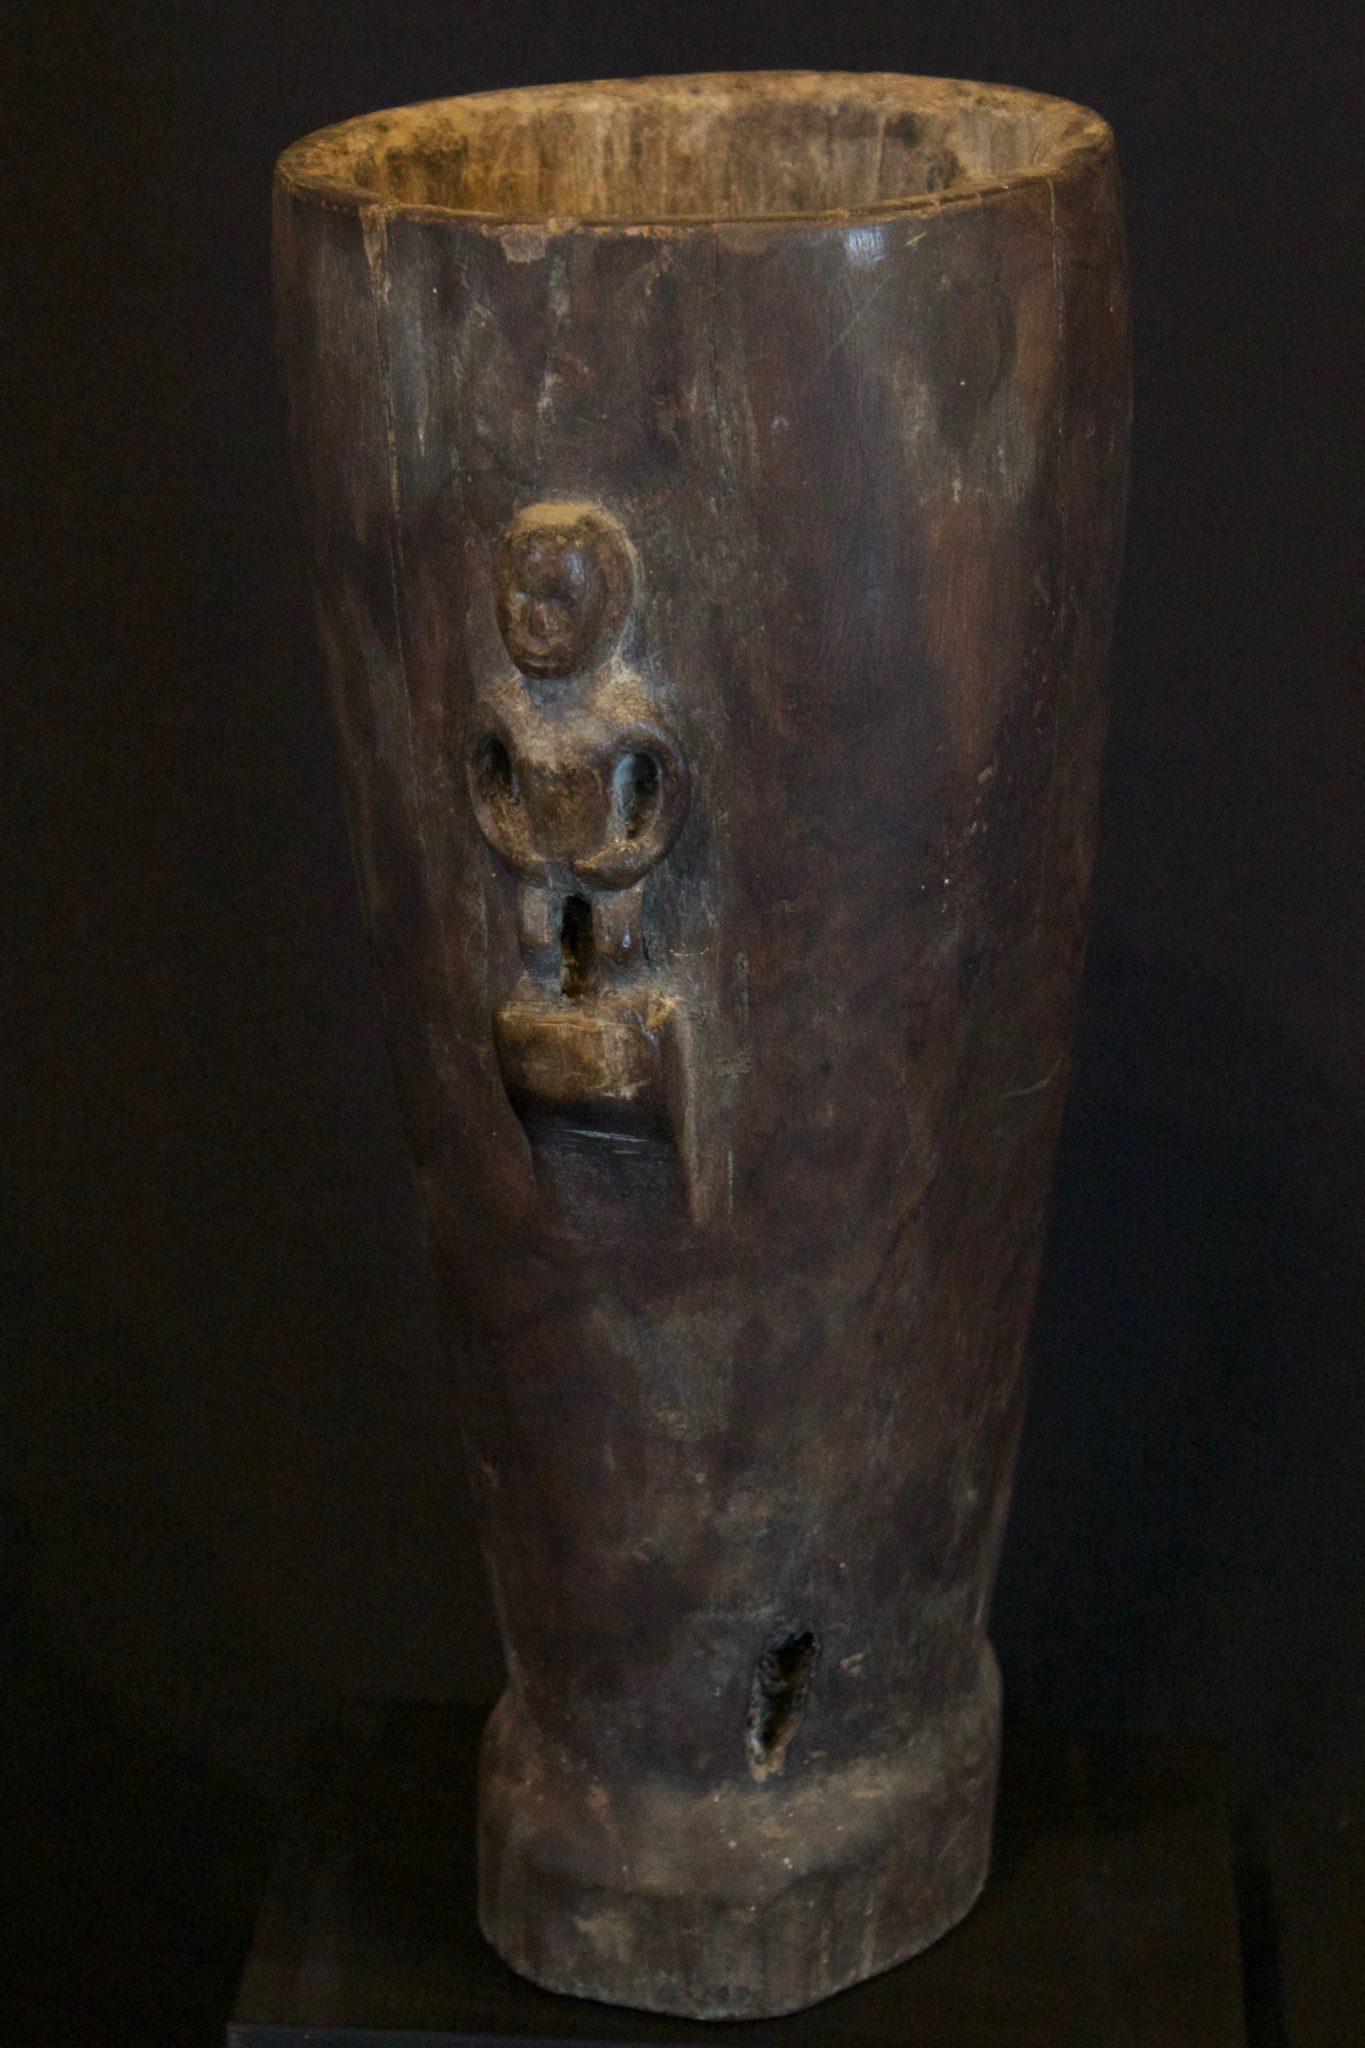 "Shaman Medicine Mortar (rare), Lesser Sunda Islands, Indonesia, Early 20th c, Wood. Preparing medicines using a pestle to grind, 10 ¾"" x 4"" x 4 ½"", $425."